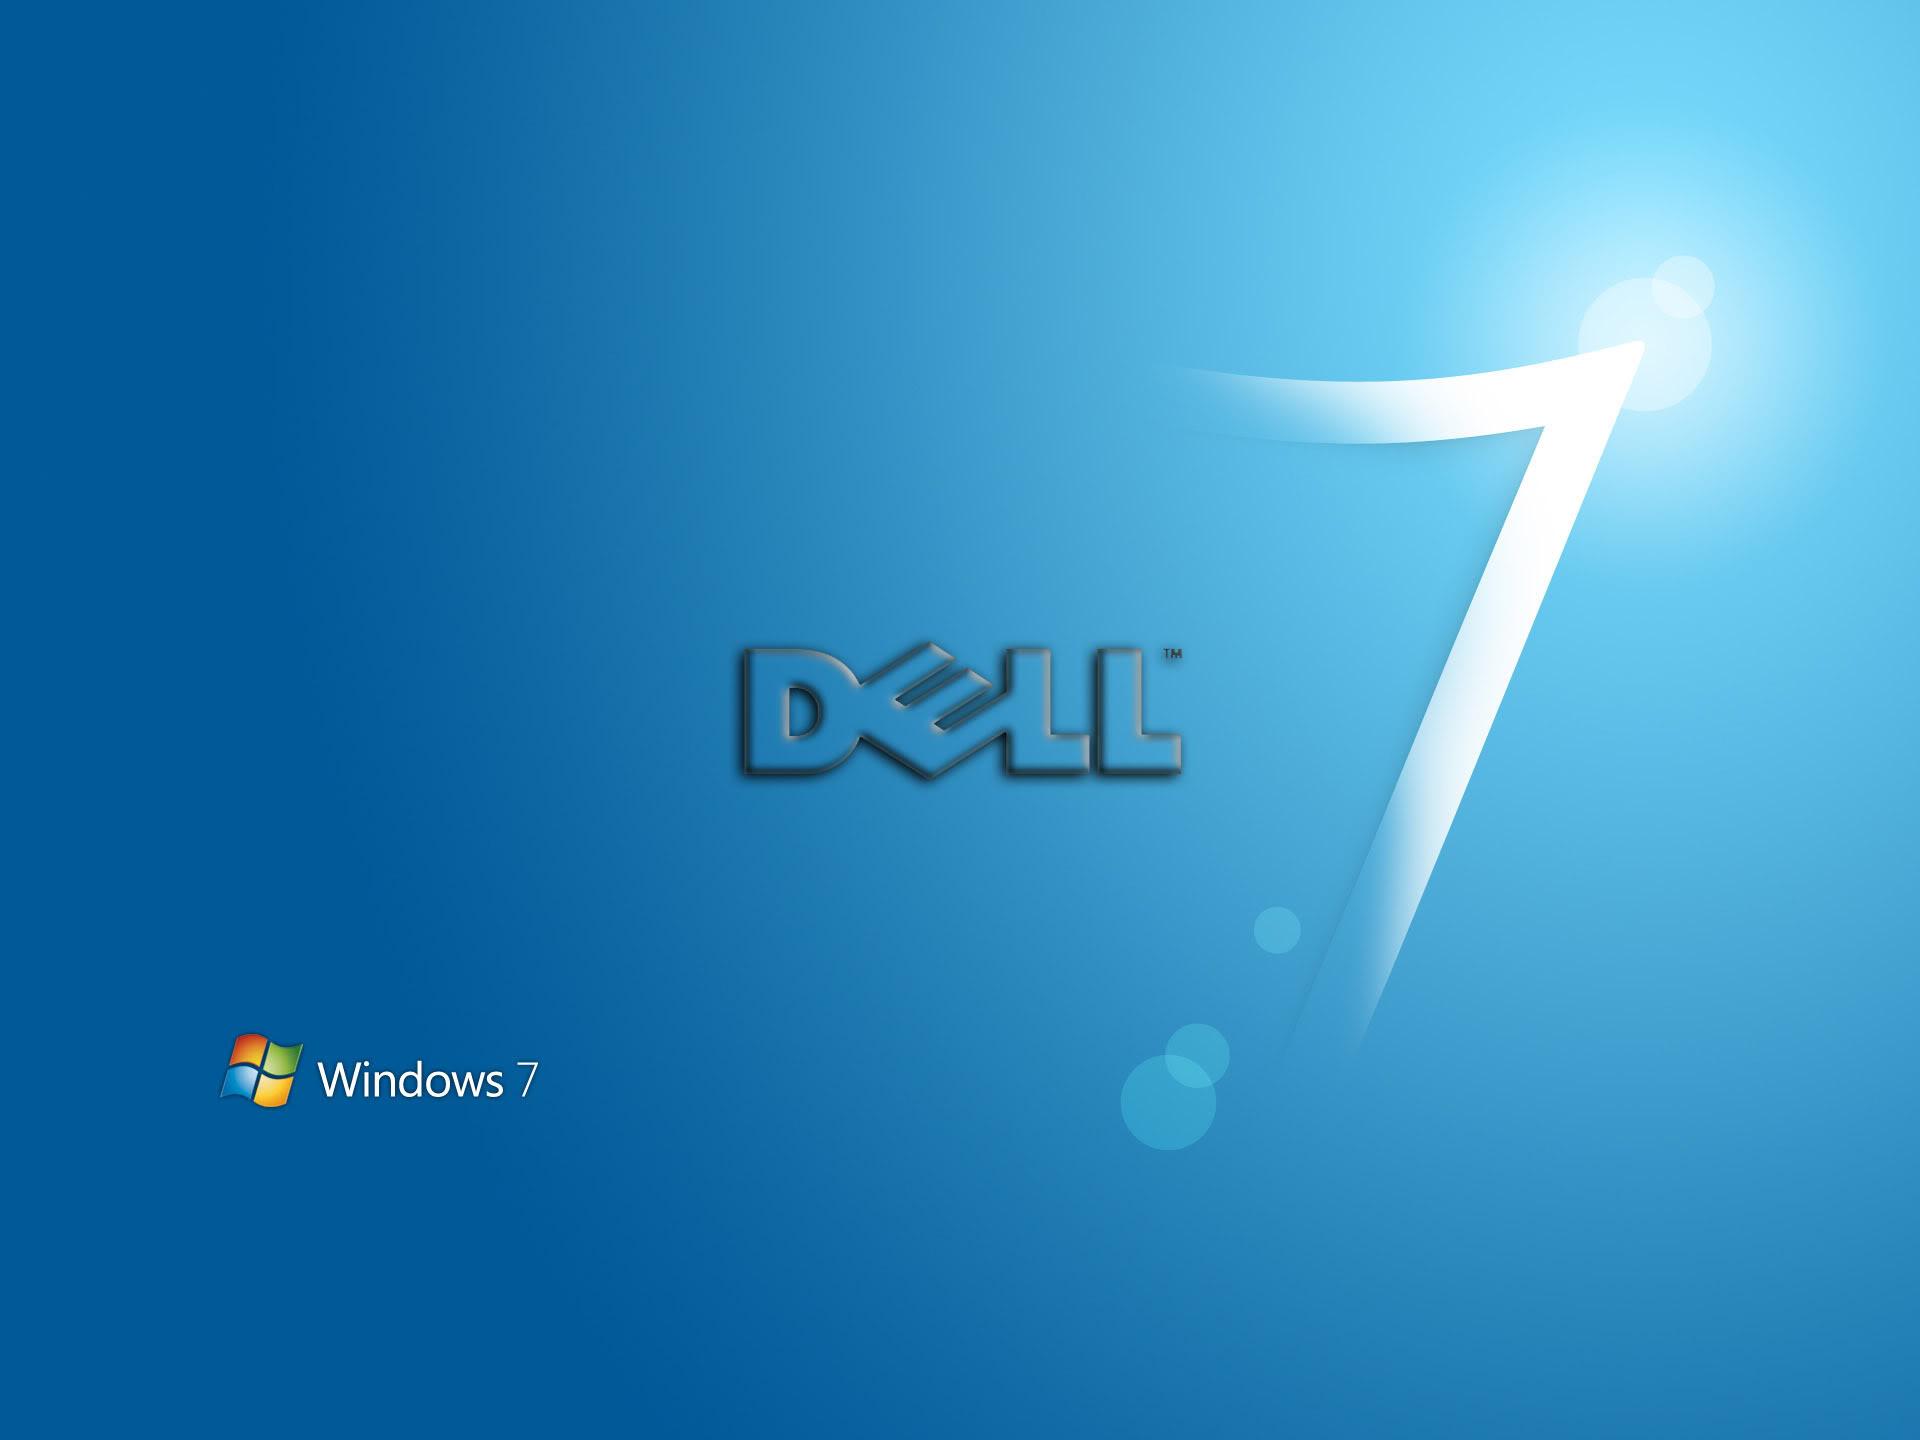 Dell Background Blue Wallpaper Hd